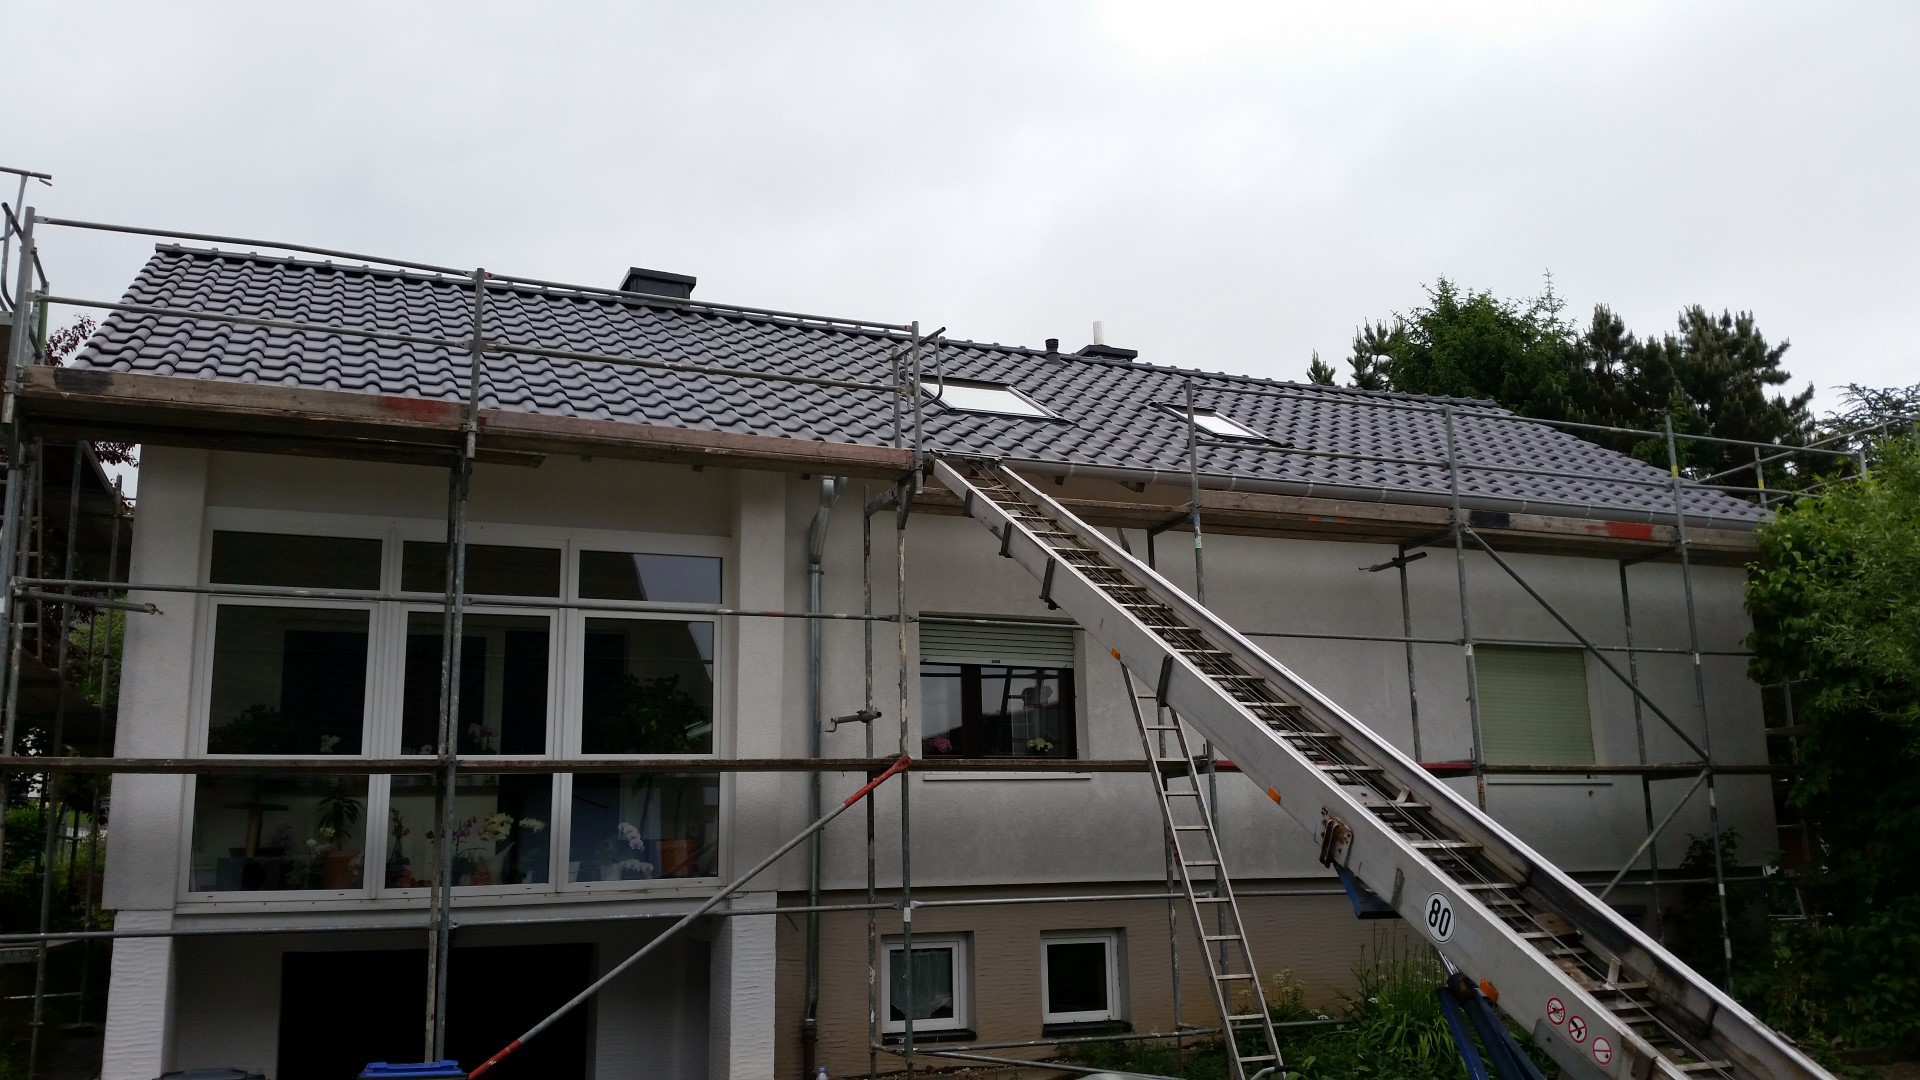 Dachsanierung-1-Flammersbach-6